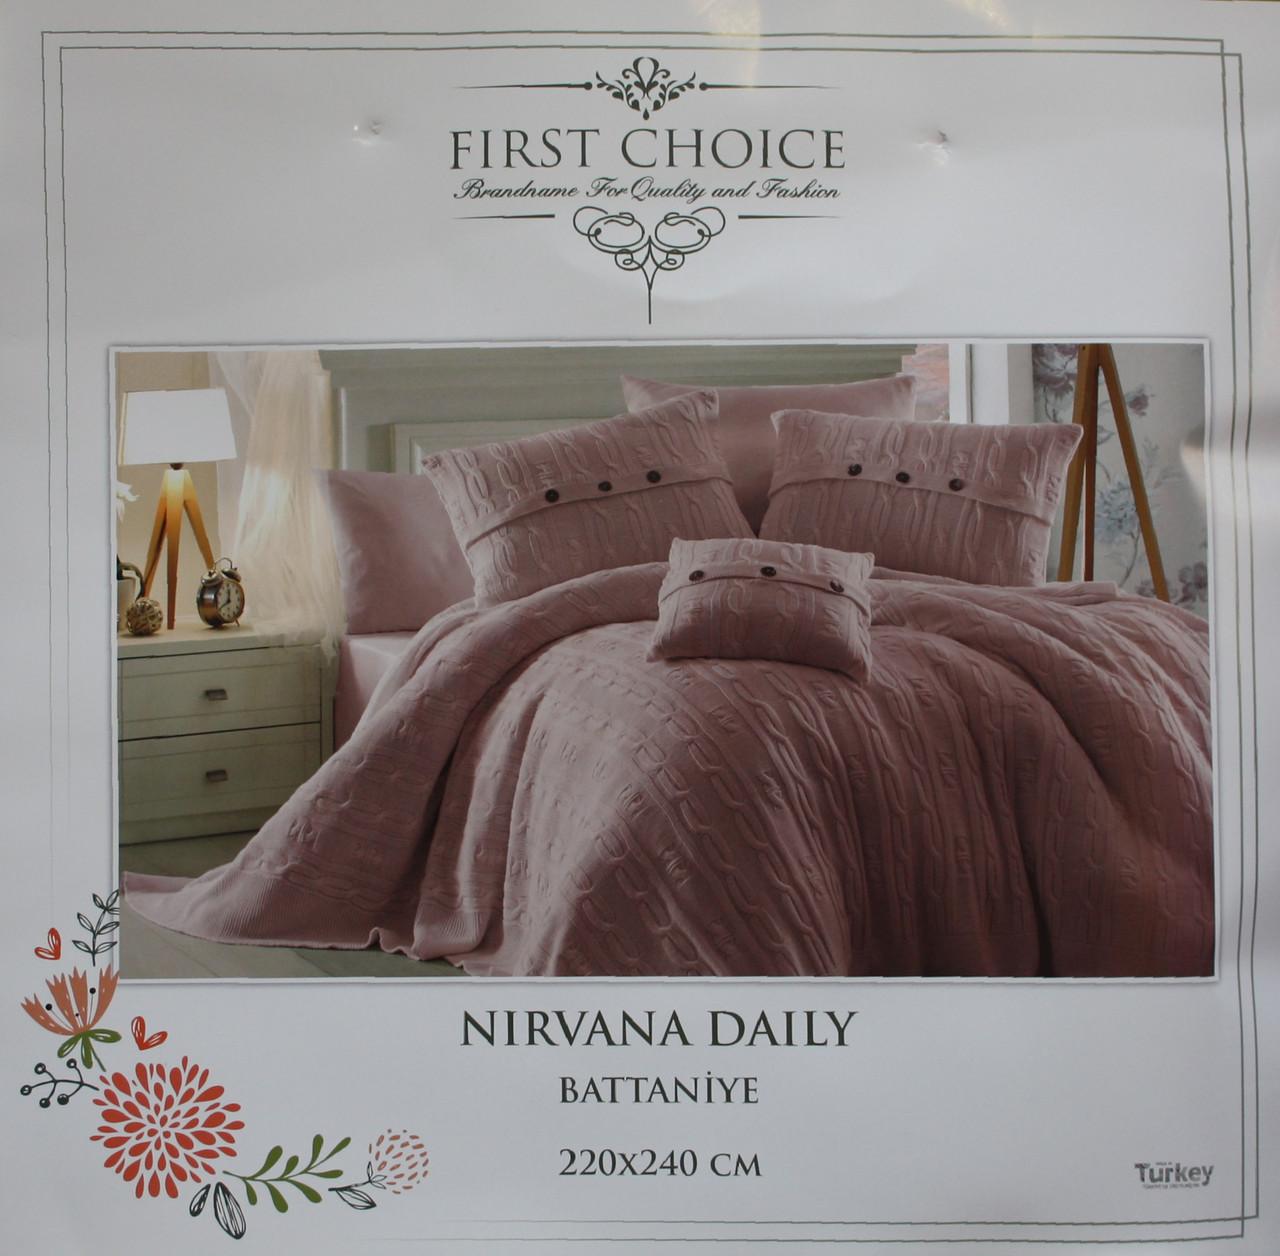 В'язаний плед-покривало (бежевий) First Сһоісе Nirvana Daily Battaniye